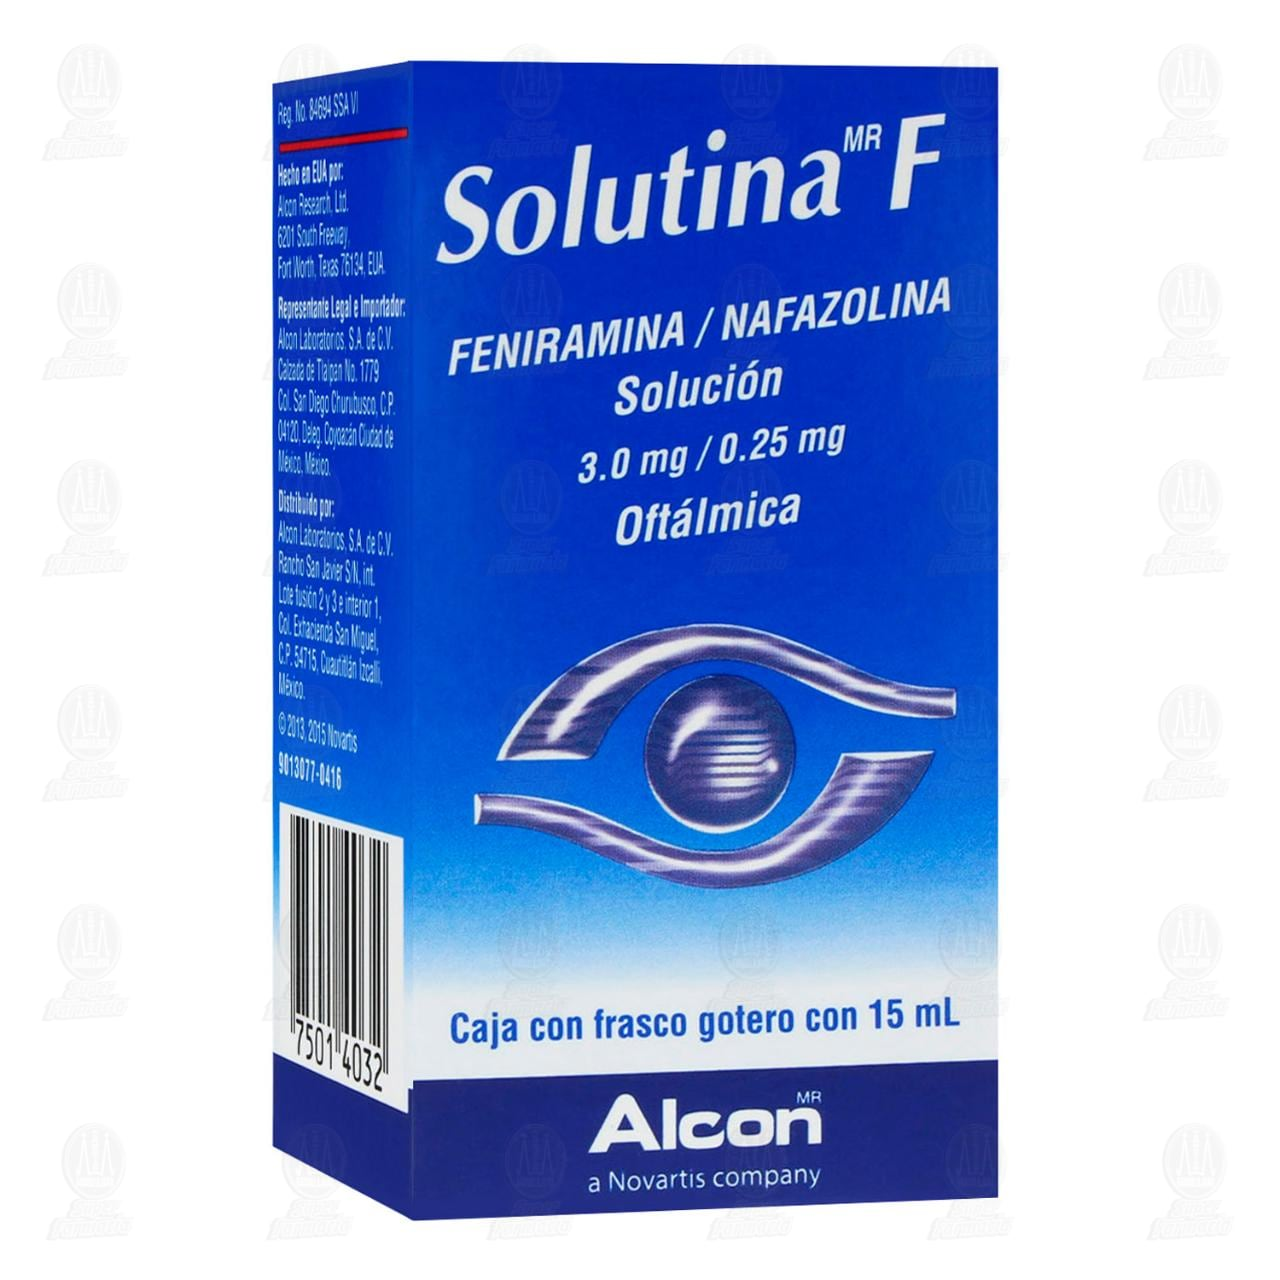 Comprar Solutina F 3.0mg/0.25mg 15ml Solución Oftálmica Gotas en Farmacias Guadalajara